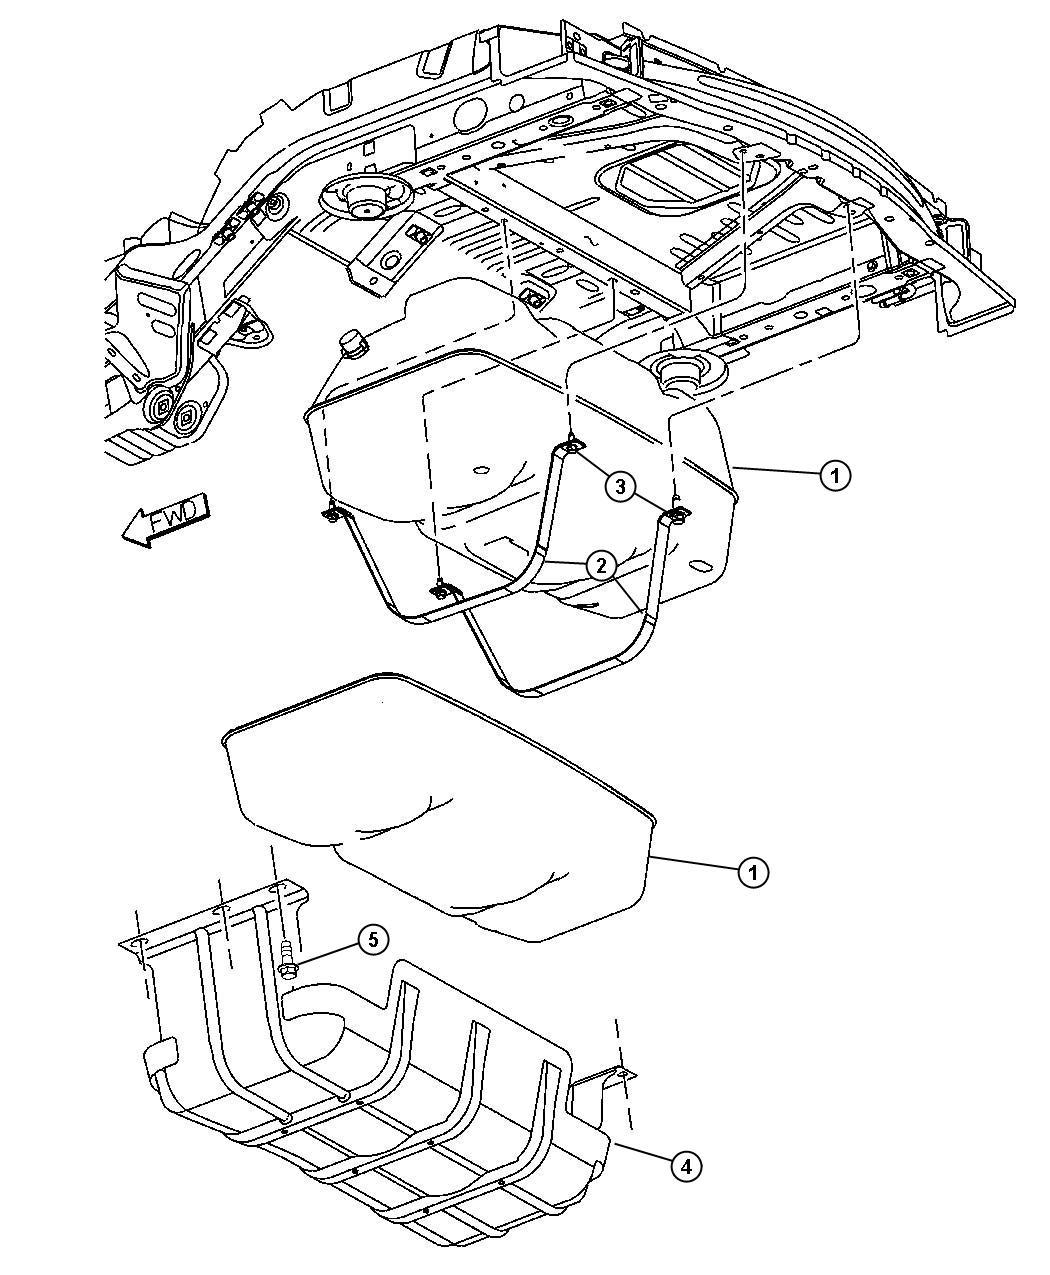 2005 Jeep Liberty Tank. Fuel. Gallon, mopar, filter